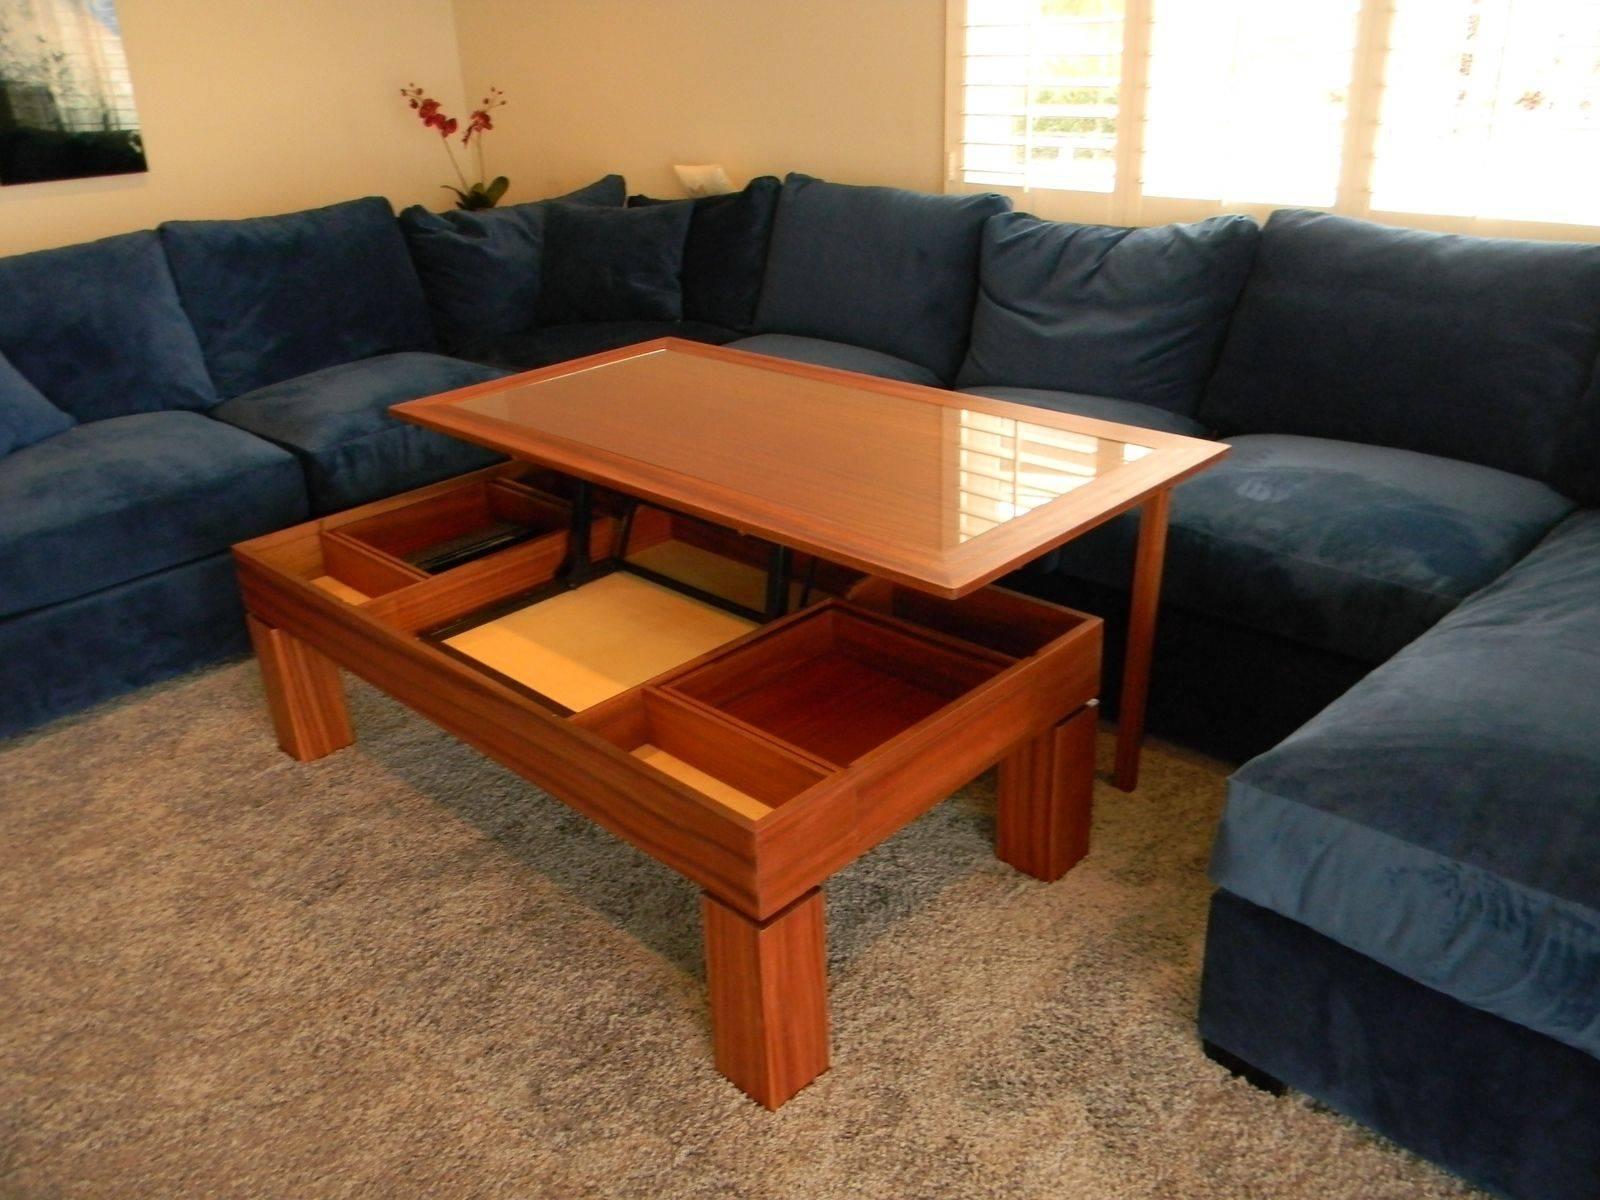 Custom Coffee Tables | Handmade Wood Coffee Tables | Custommade intended for Coffee Tables Extendable Top (Image 7 of 30)